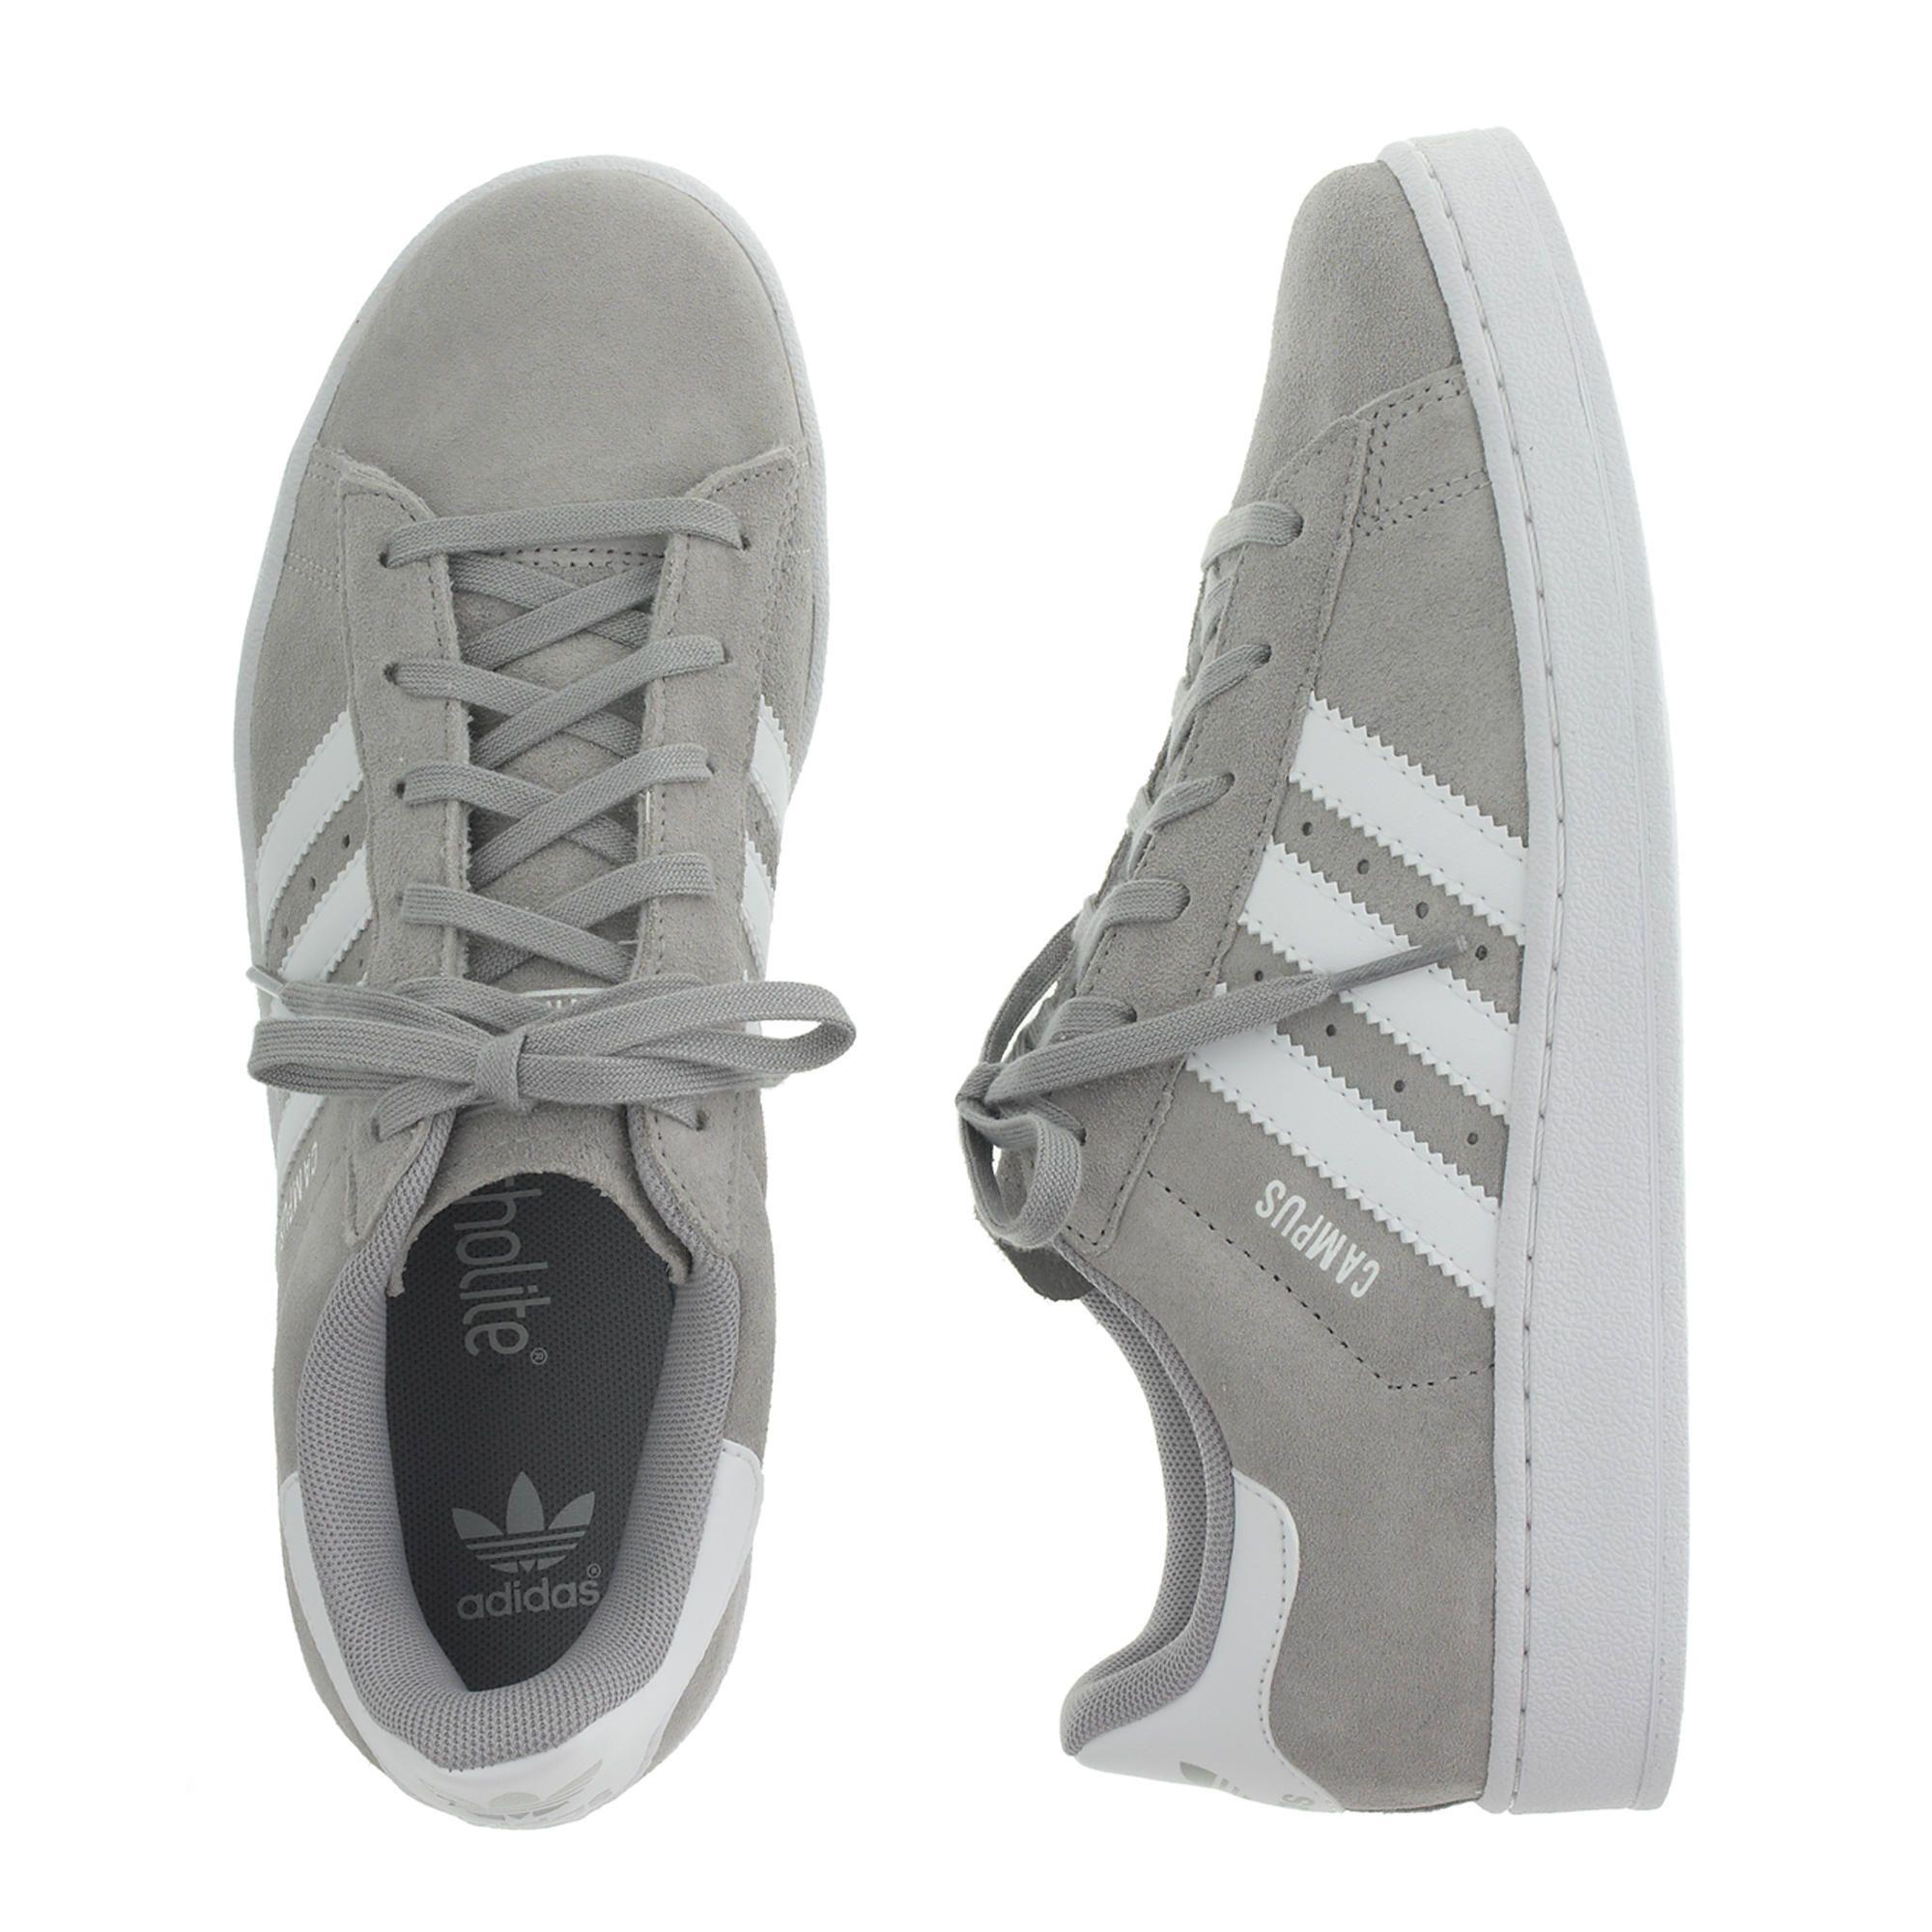 Kids'adidas ® campus scarpe in grigio in grandi dimensioni: adidas.